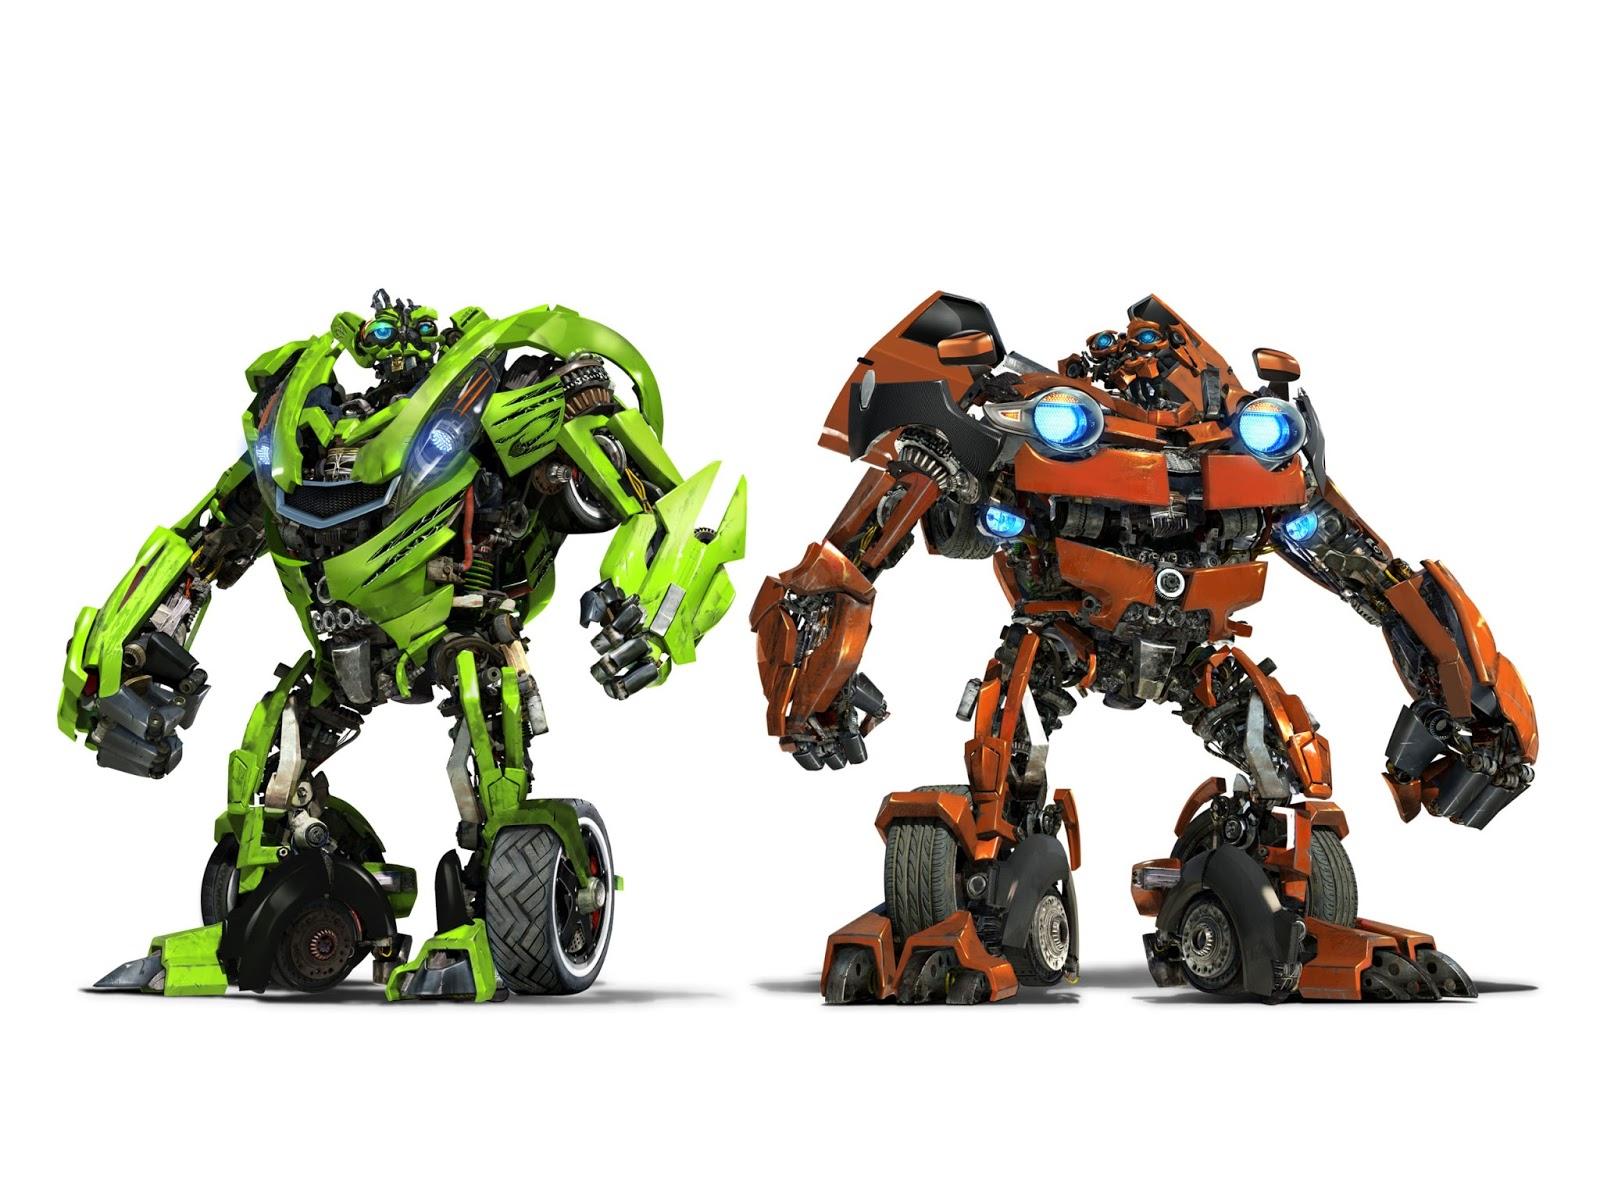 Kumpulan Gambar Kartun Robot Bergerak Terbaru Kolek Gambar